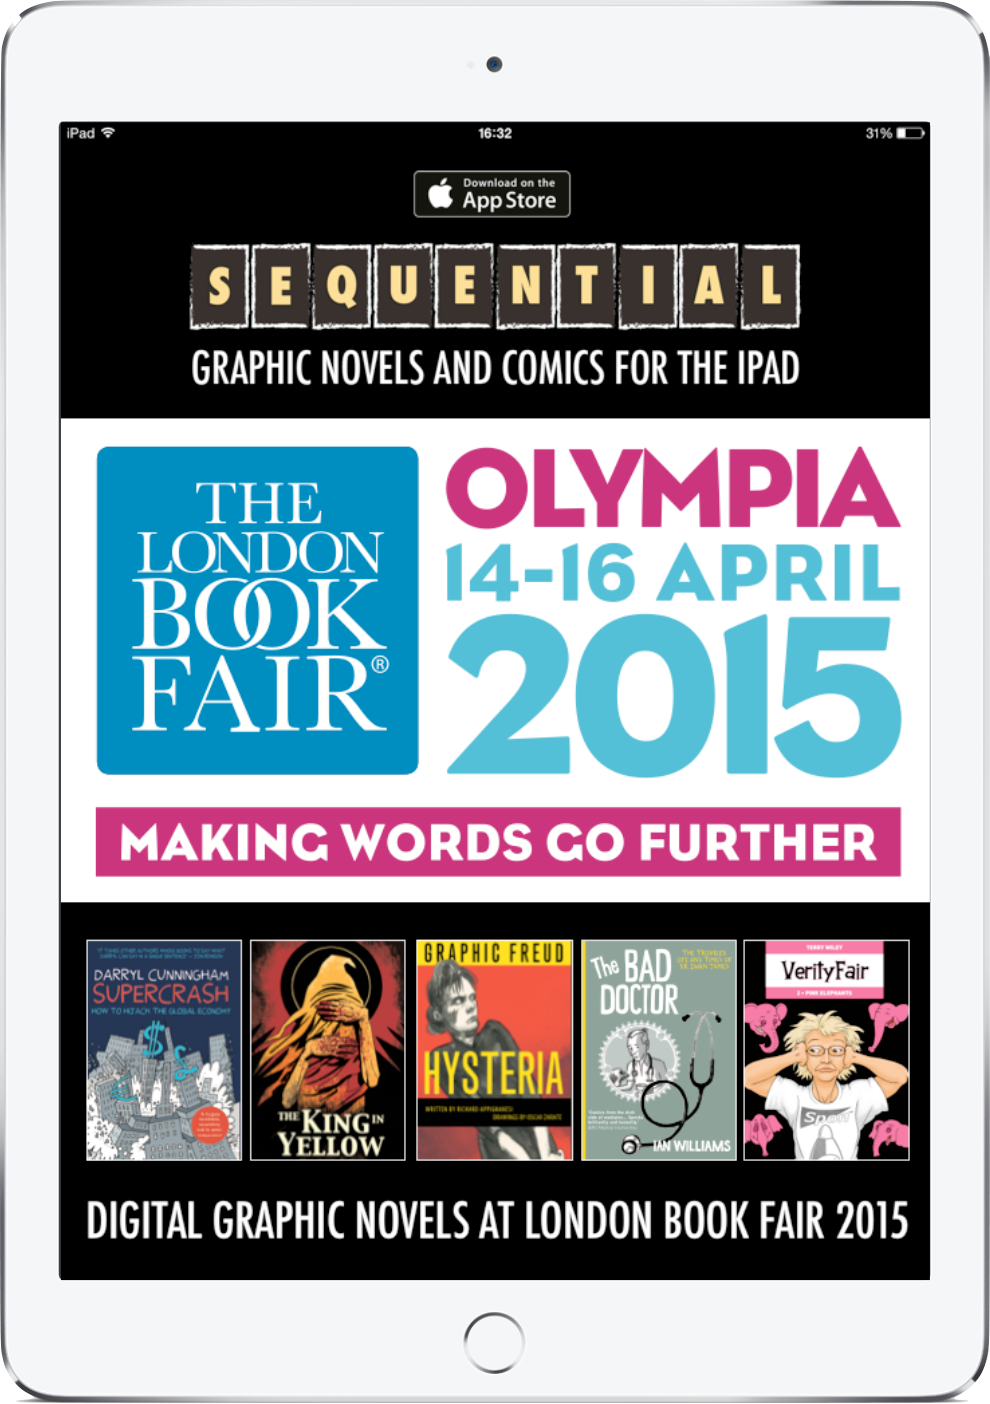 SEQUENTIAL London Book Fair Promotion